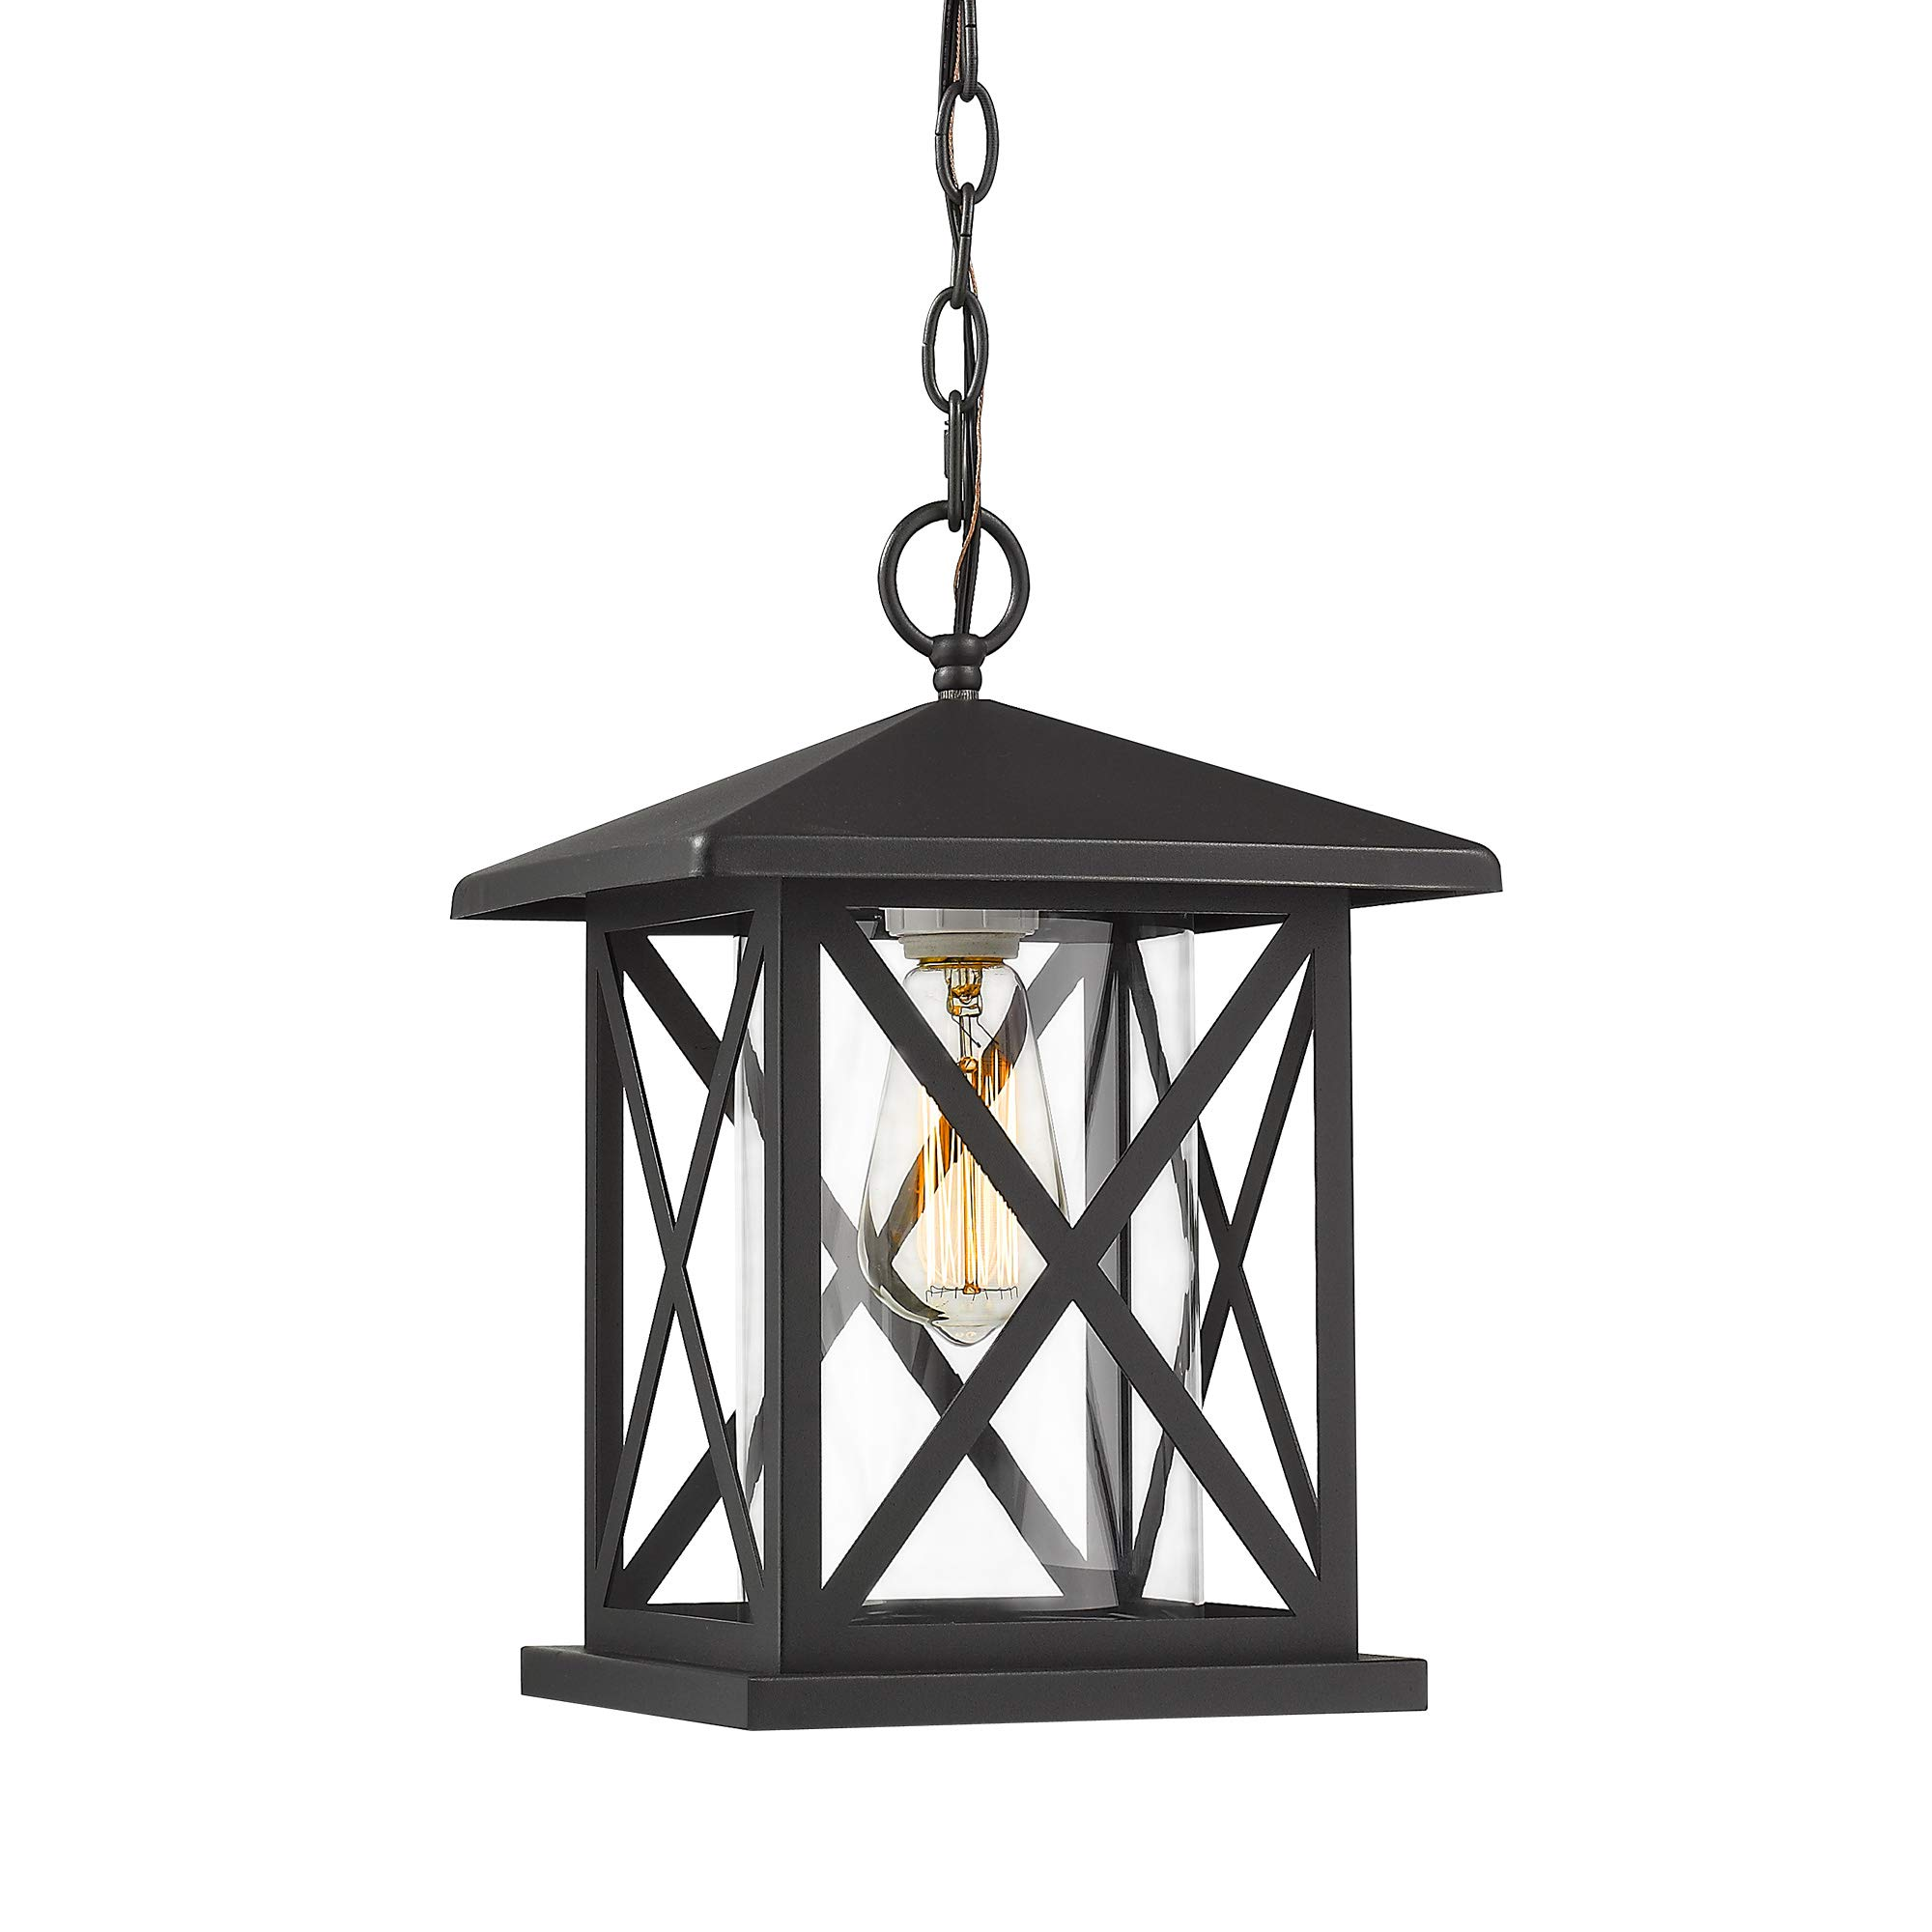 Jazava Exterior Hanging Lantern, 1-Light Outdoor Pendant Lighting for Entrance, Height Adjustable, Matte Black Finish with Clear Glass, Big